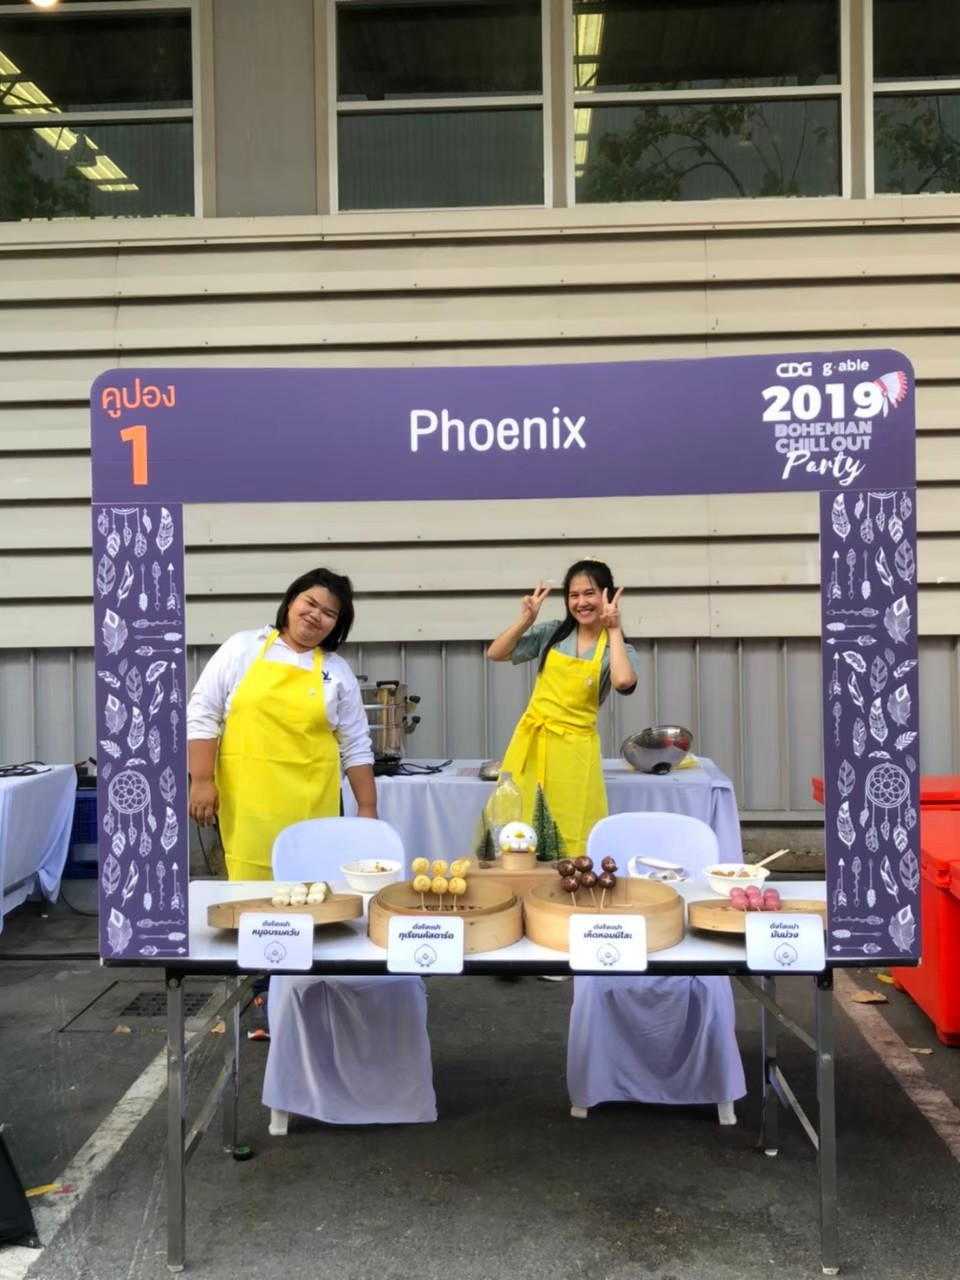 Snack Box      ขนมประชุม  อีเว้นท์   เขต วัฒนา สวนหลวง ห้วยขวาง  บางนา      ขนม Snack จาก Phoenix Lava